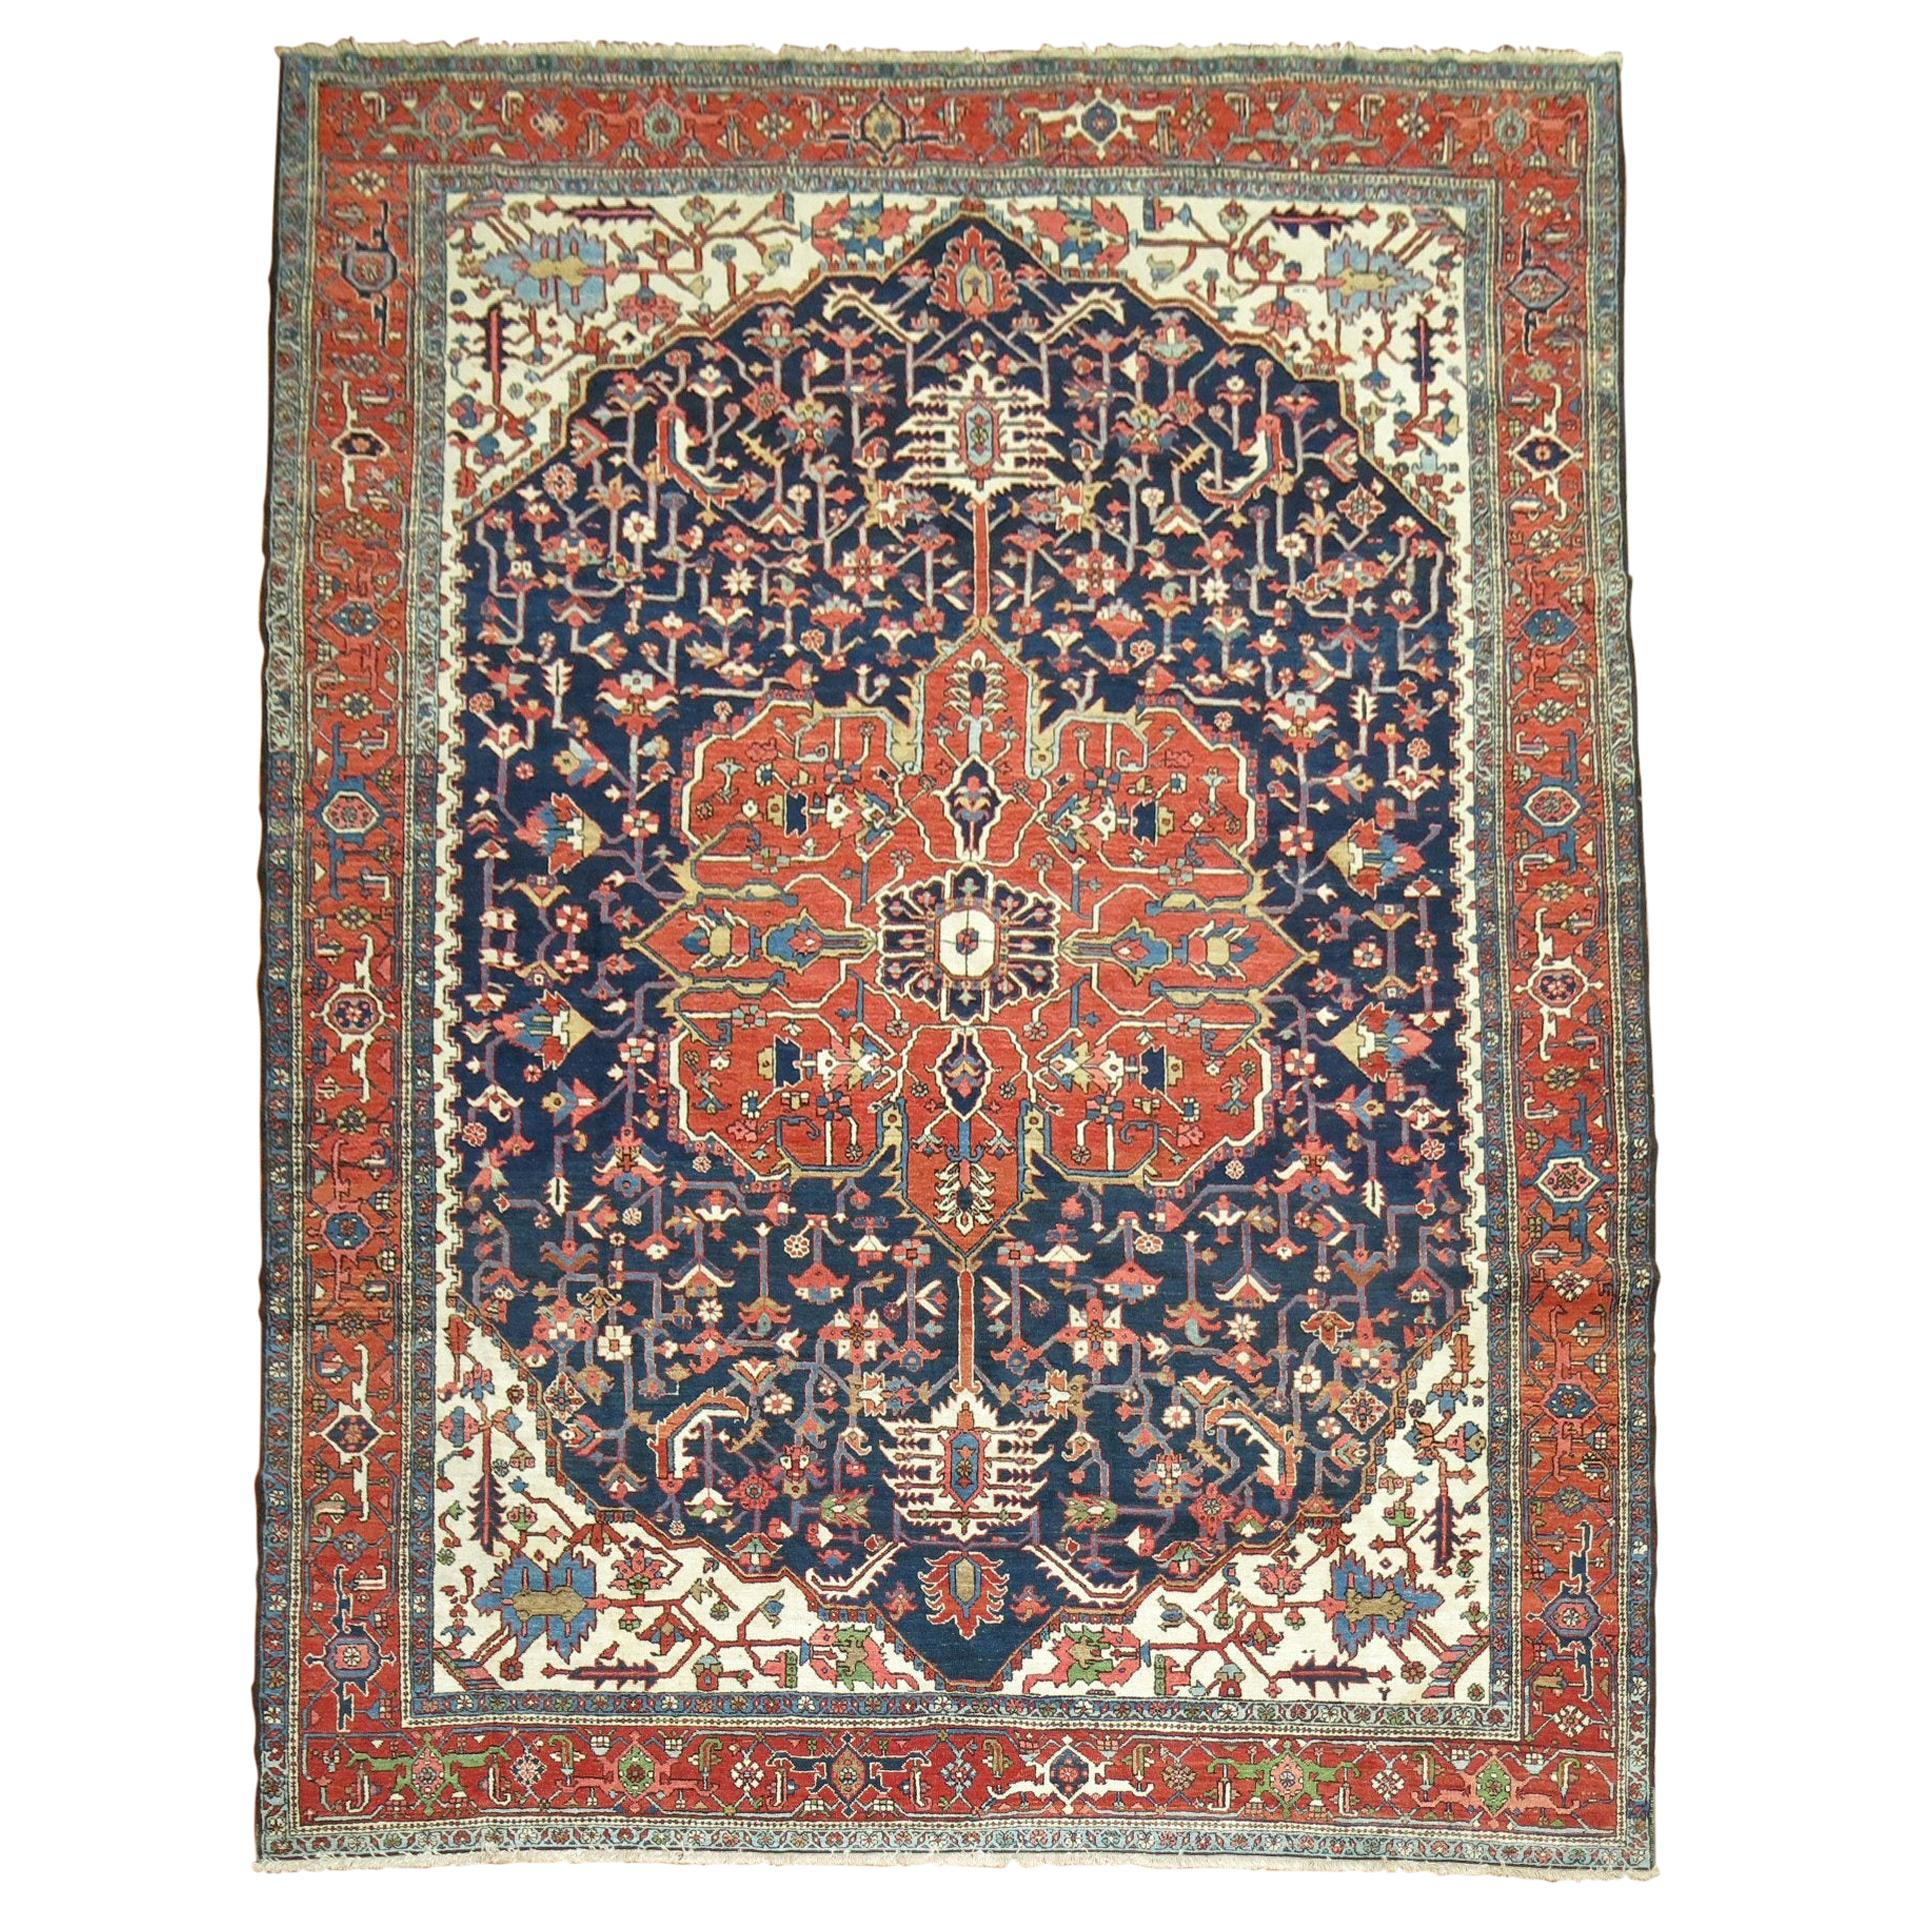 Traditional Antique Persian Square Navy Geometric Heriz Rug